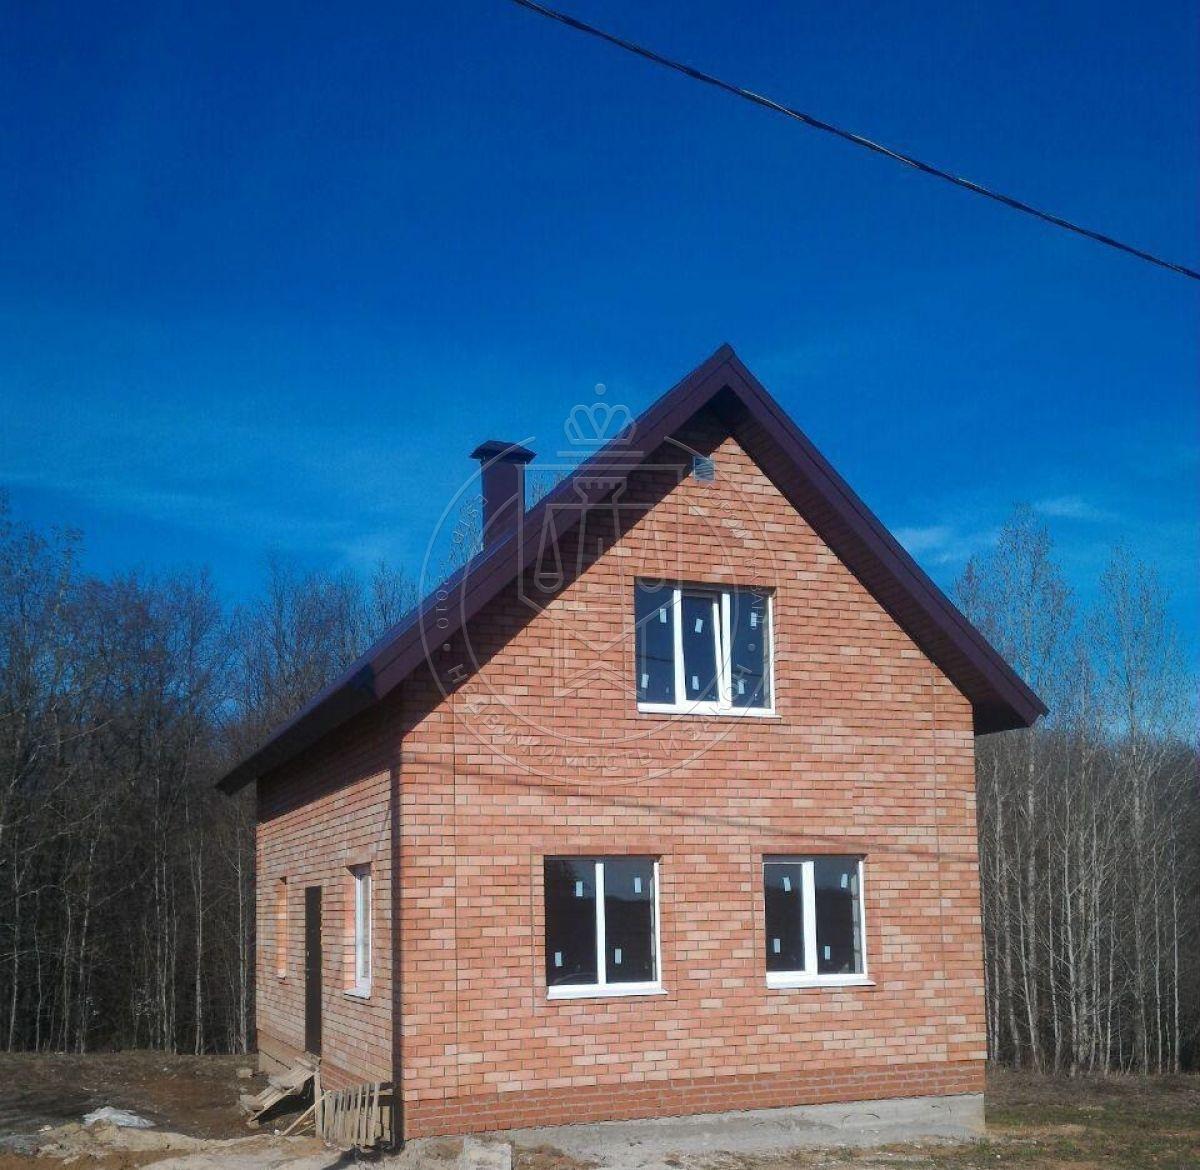 Продажа  дома п. Новое Шигалеево, ул Озерная, 96 м²  (миниатюра №2)